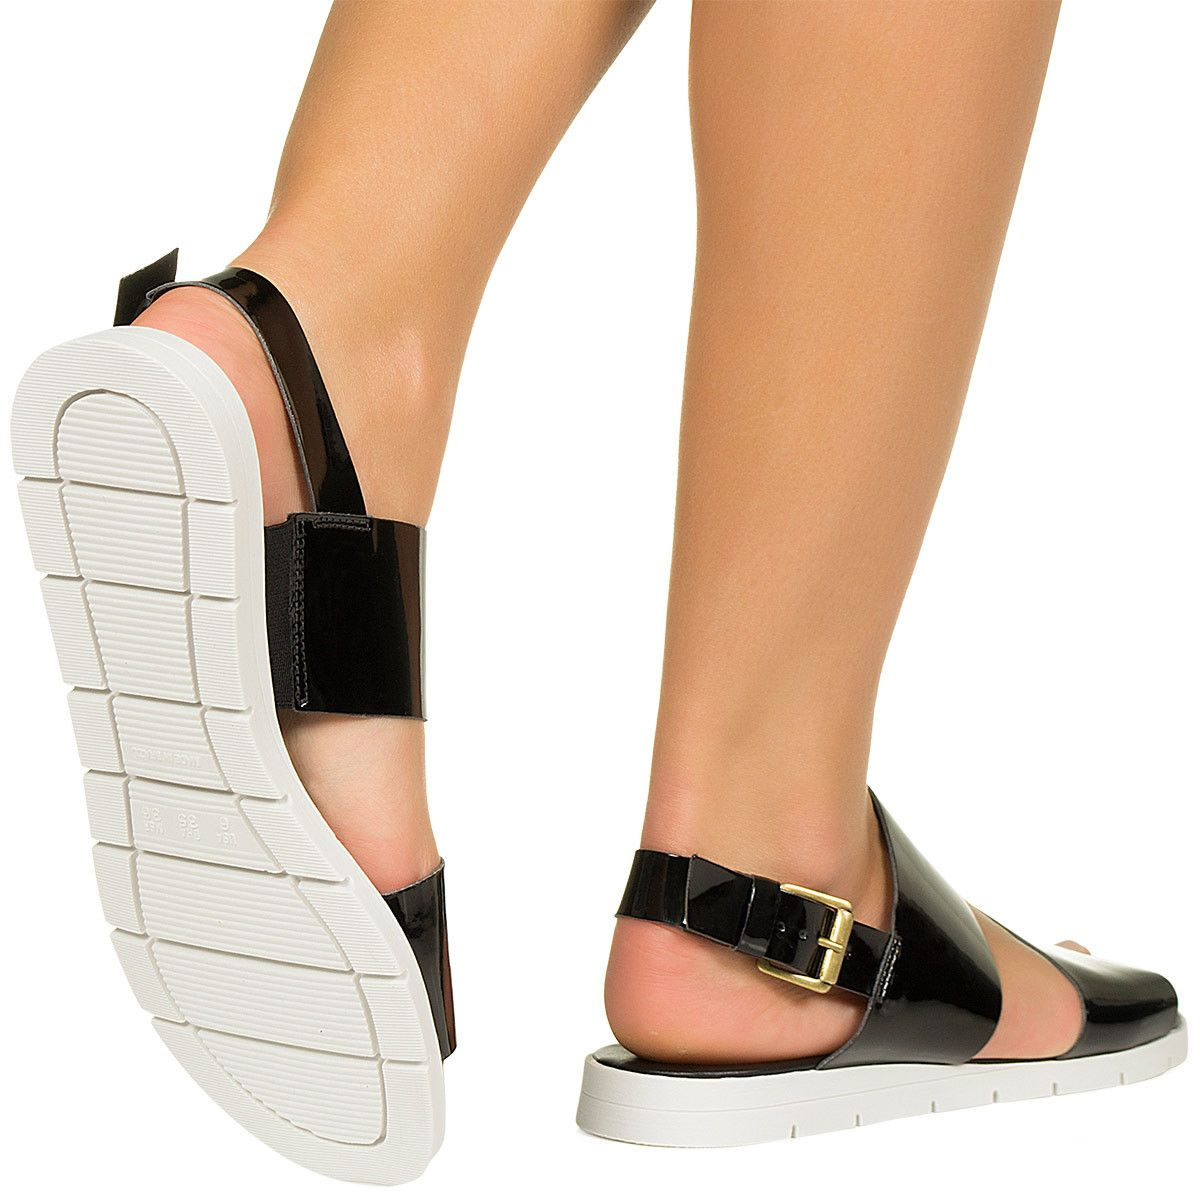 741802f97 Sandalia flatform preta verniz Taquilla - Taquilla - Loja online de sapatos  femininos